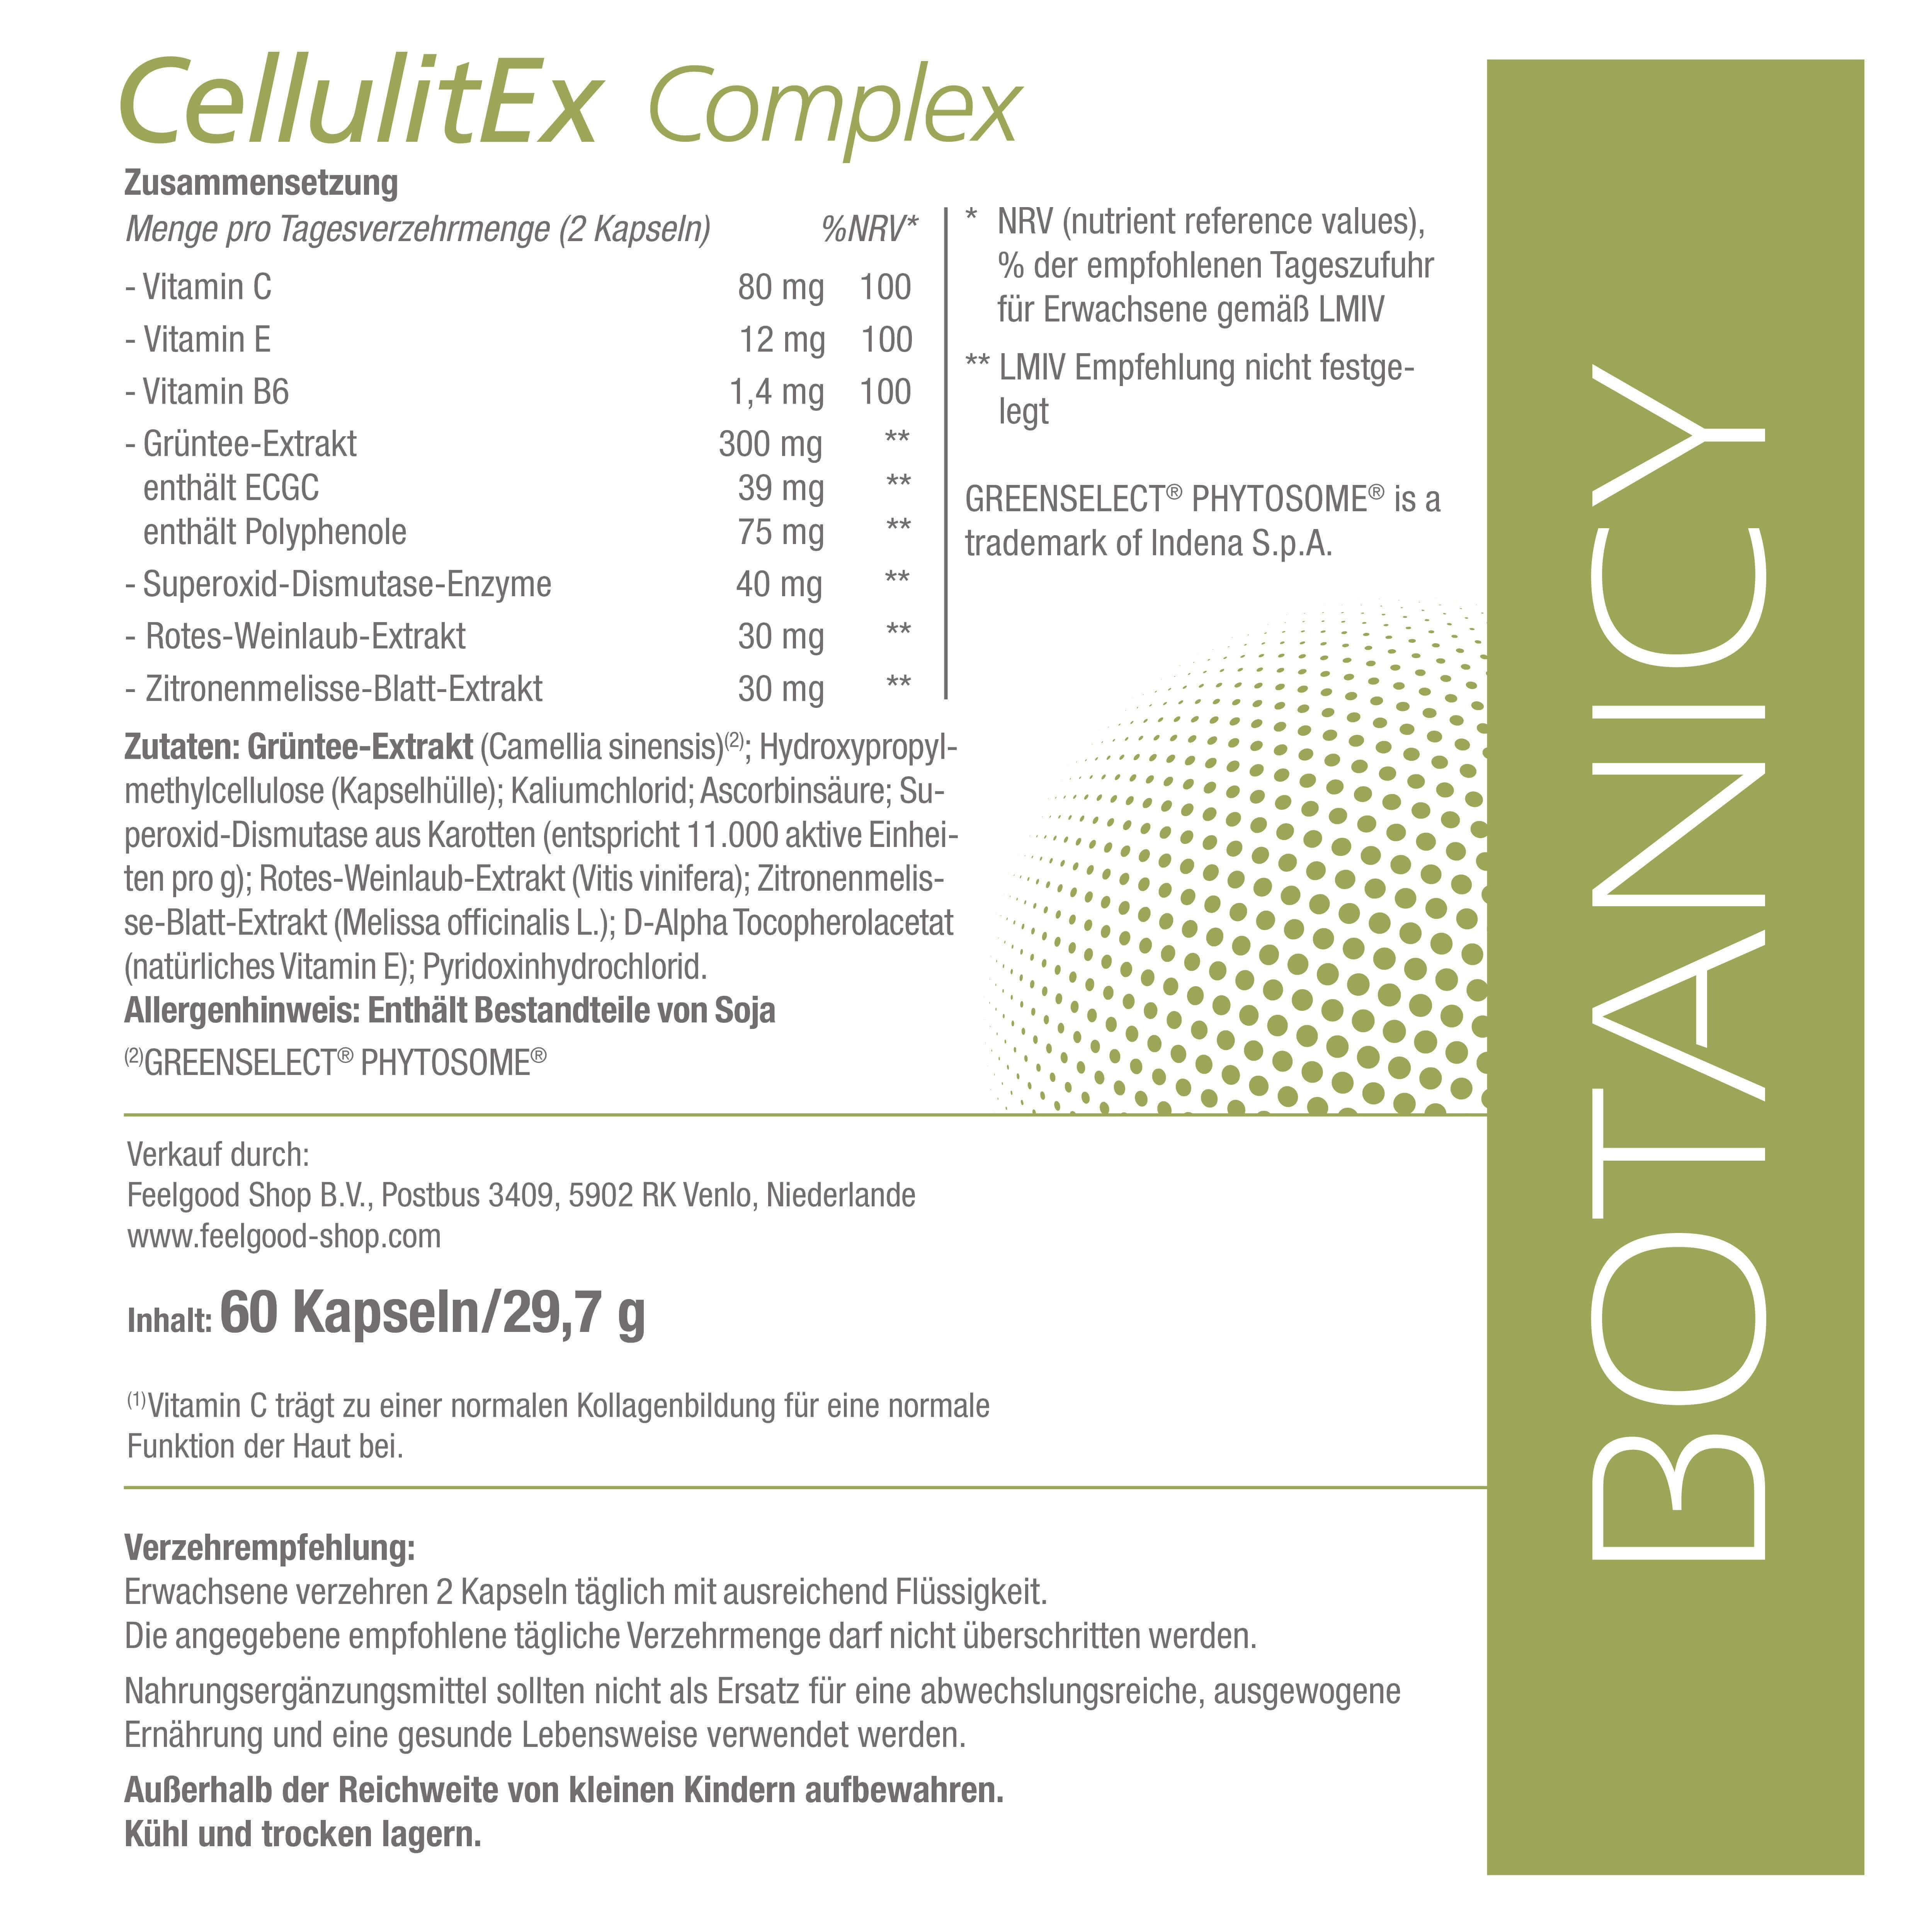 CellulitEx Complex